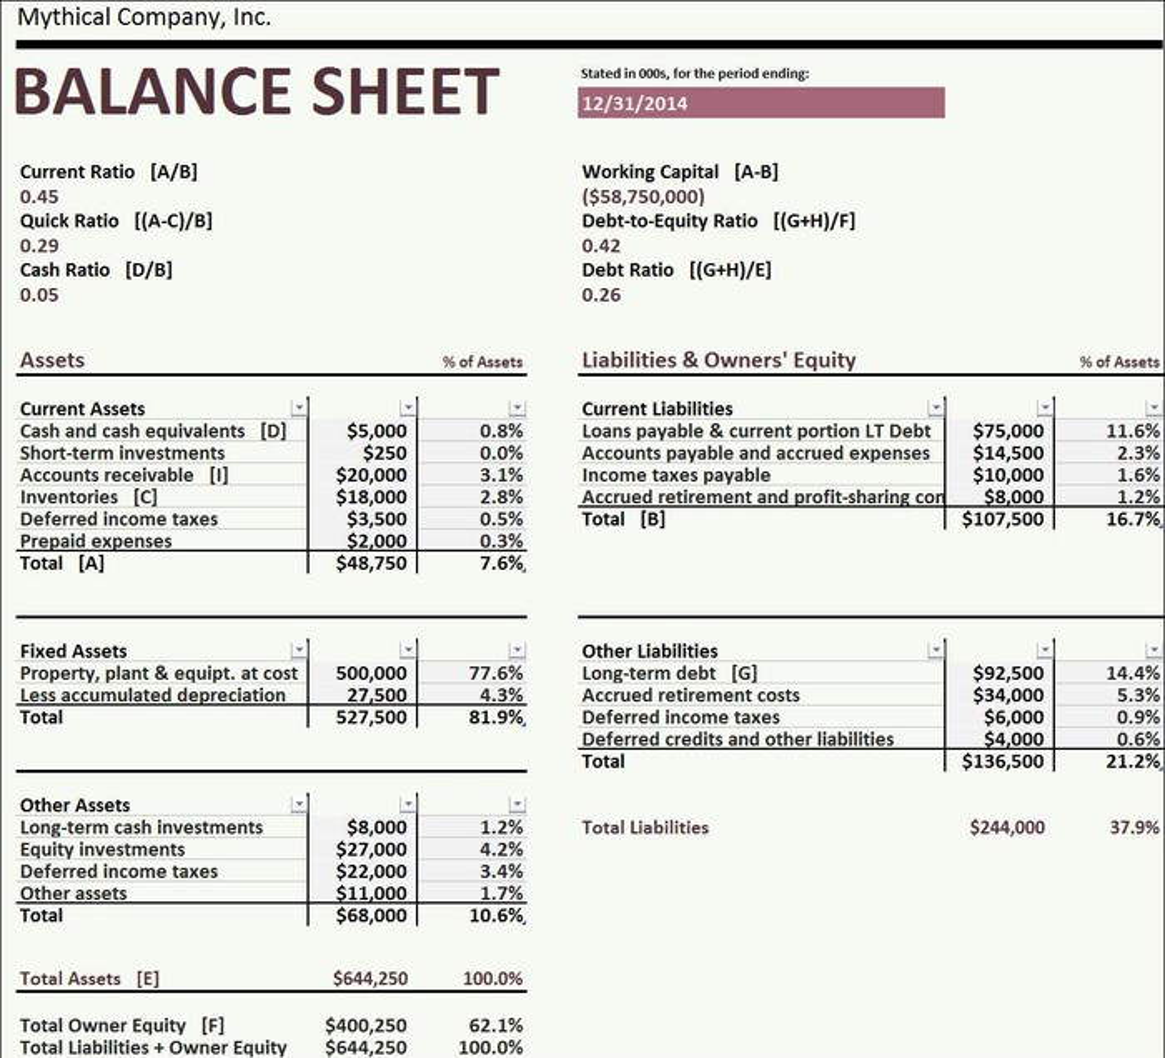 Balance Sheet Template | What Is A Strong Balance Sheet The Motley Fool